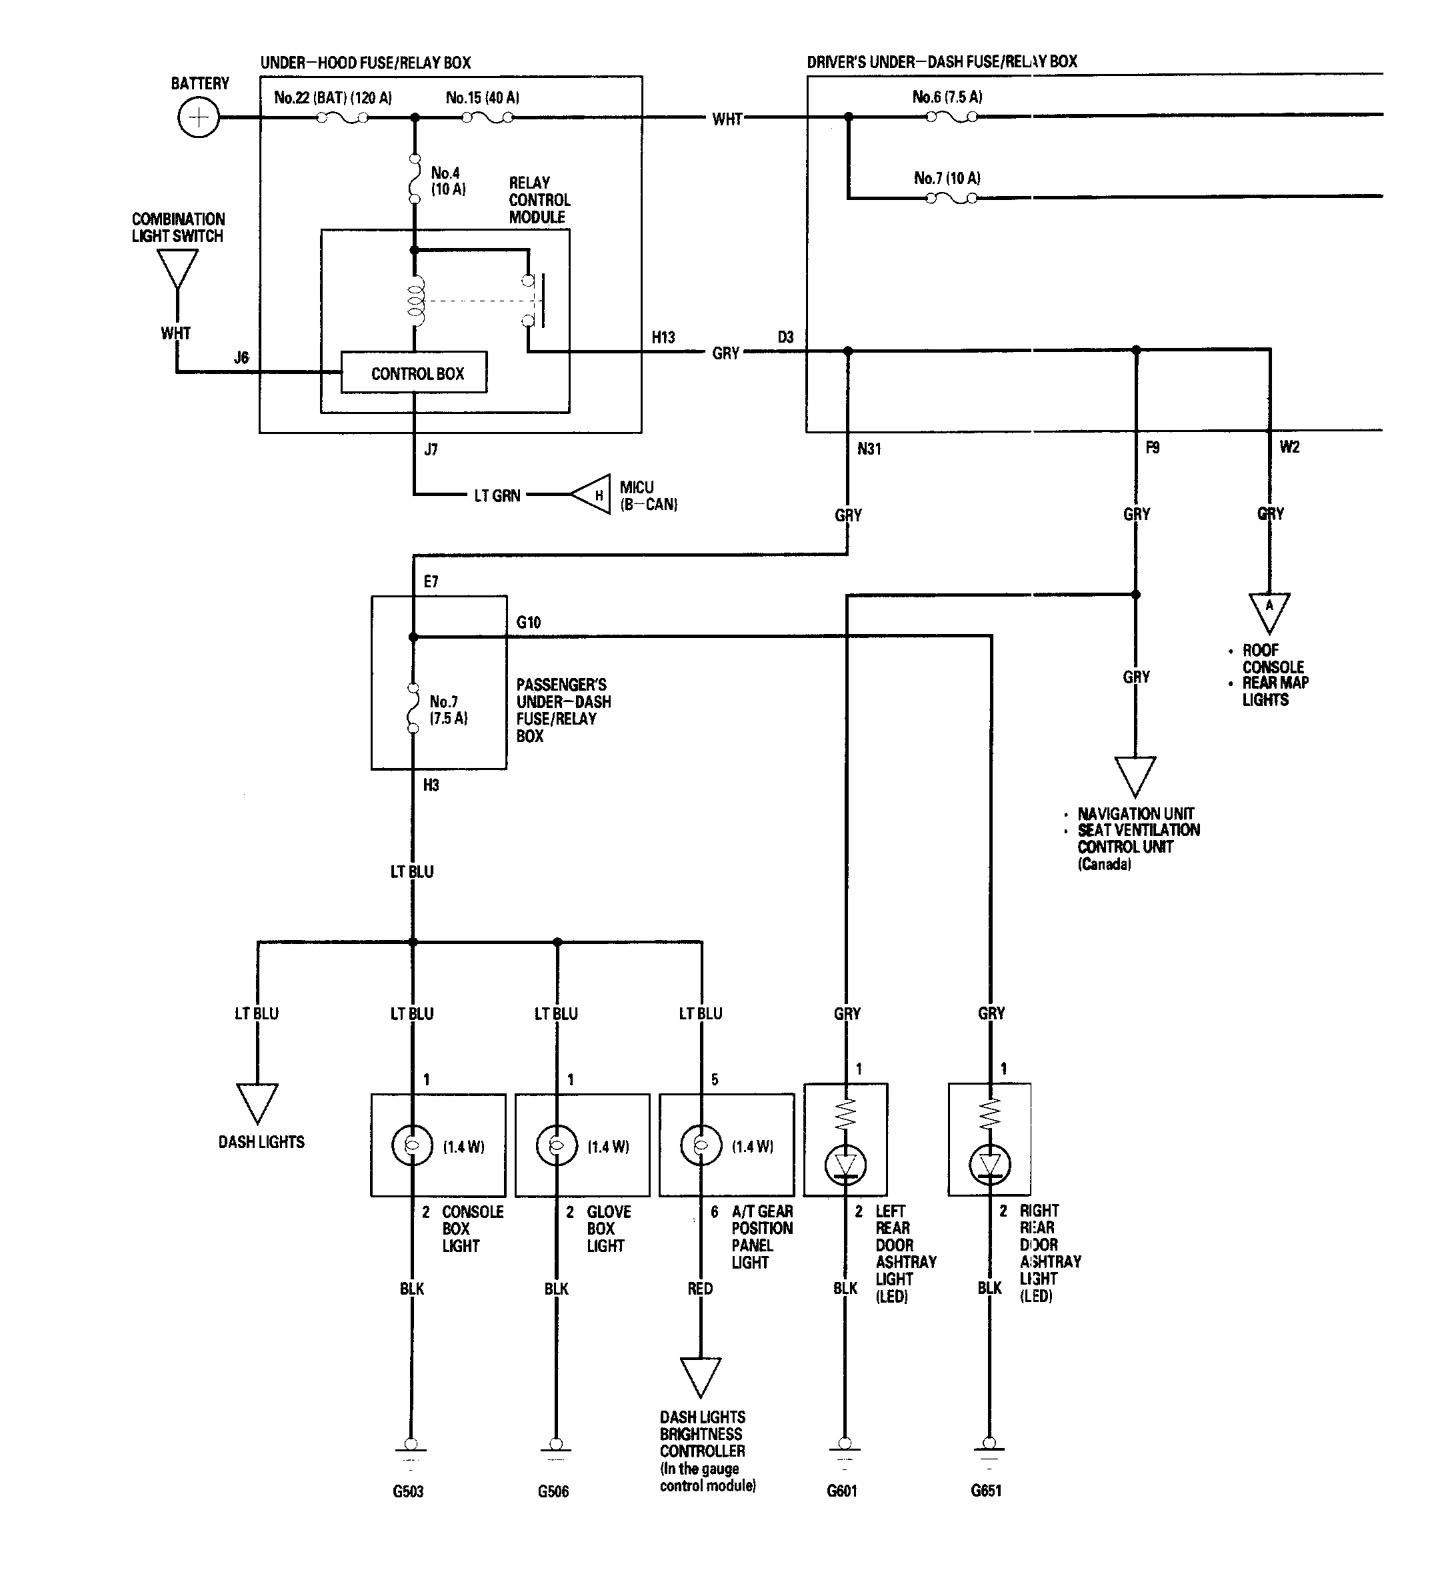 2006 Coachmen Wiring Diagram Lights Library Acura Rl Find U2022 Rv Electrical Schematics